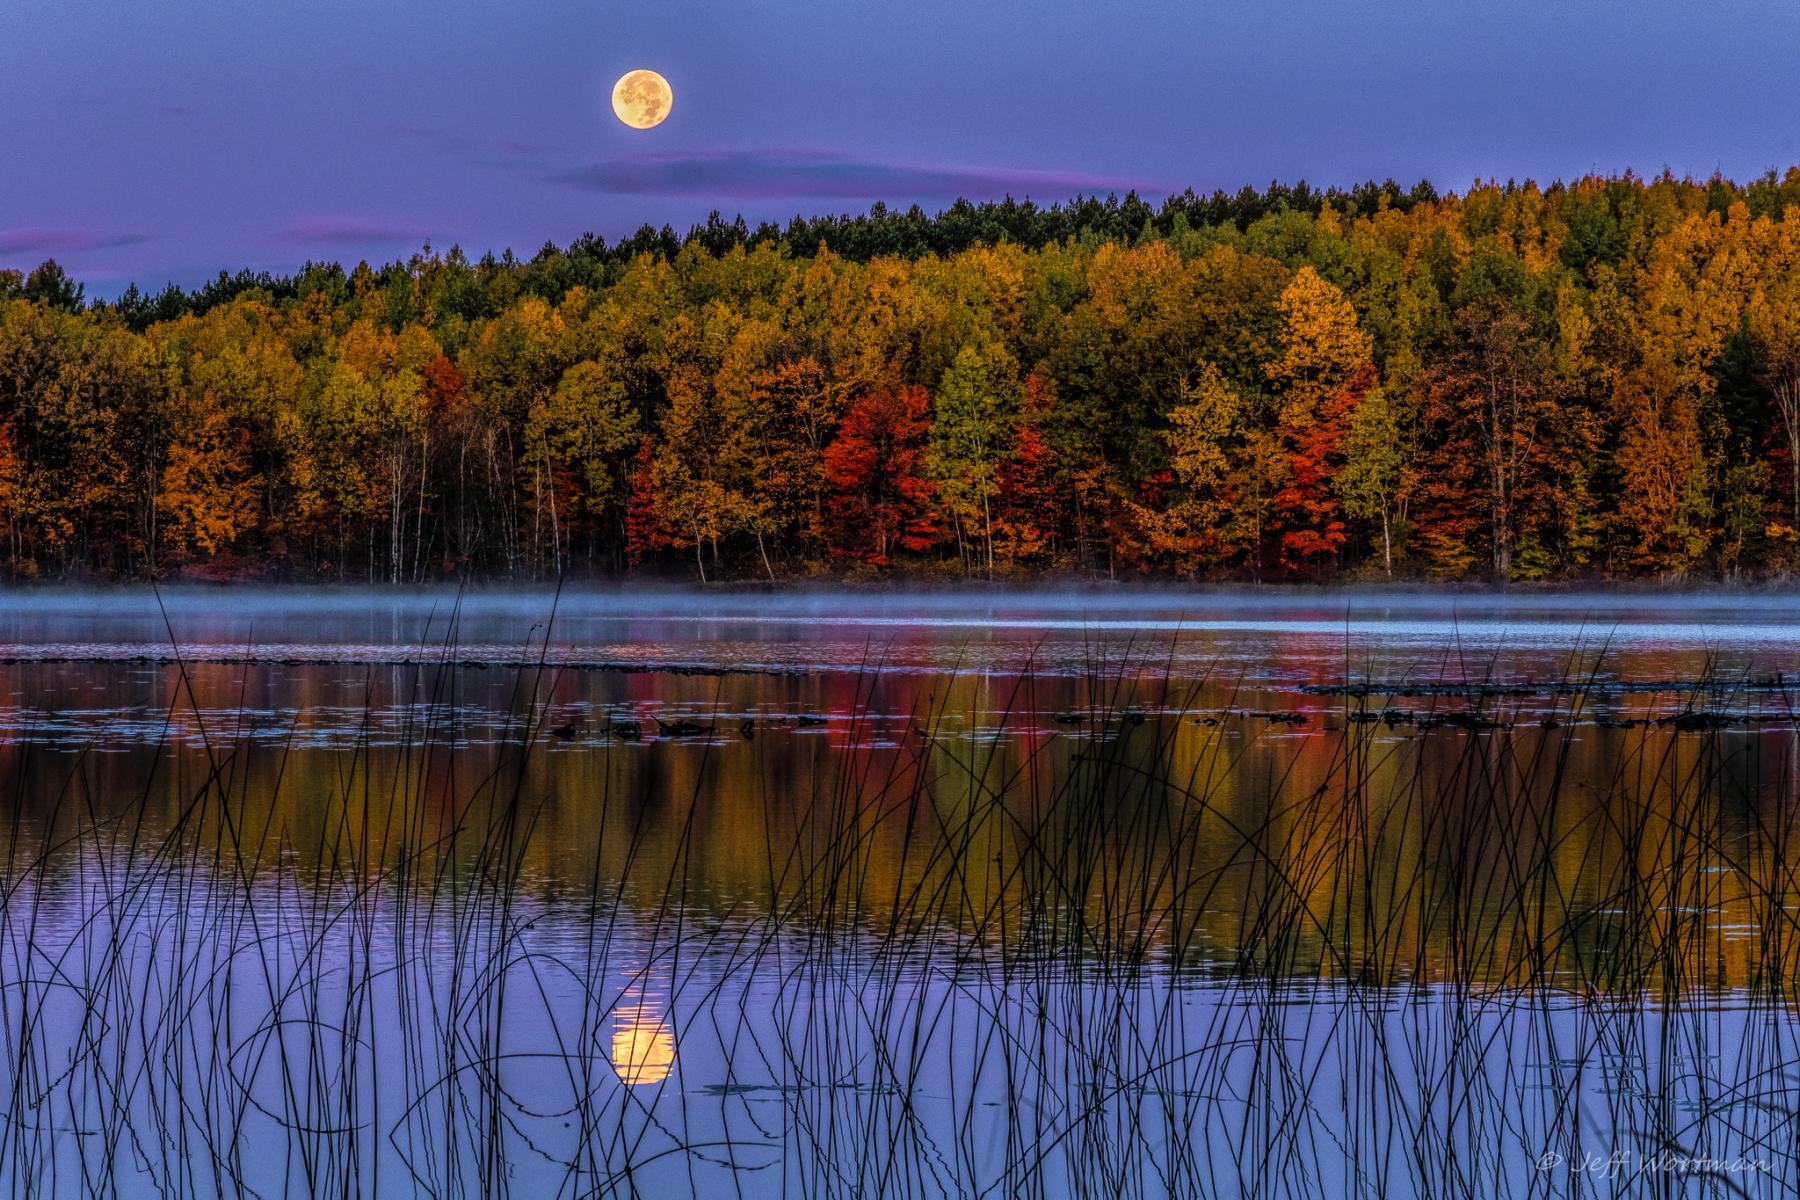 Jeff Wortman, Hunters Moon over Thornton Lake